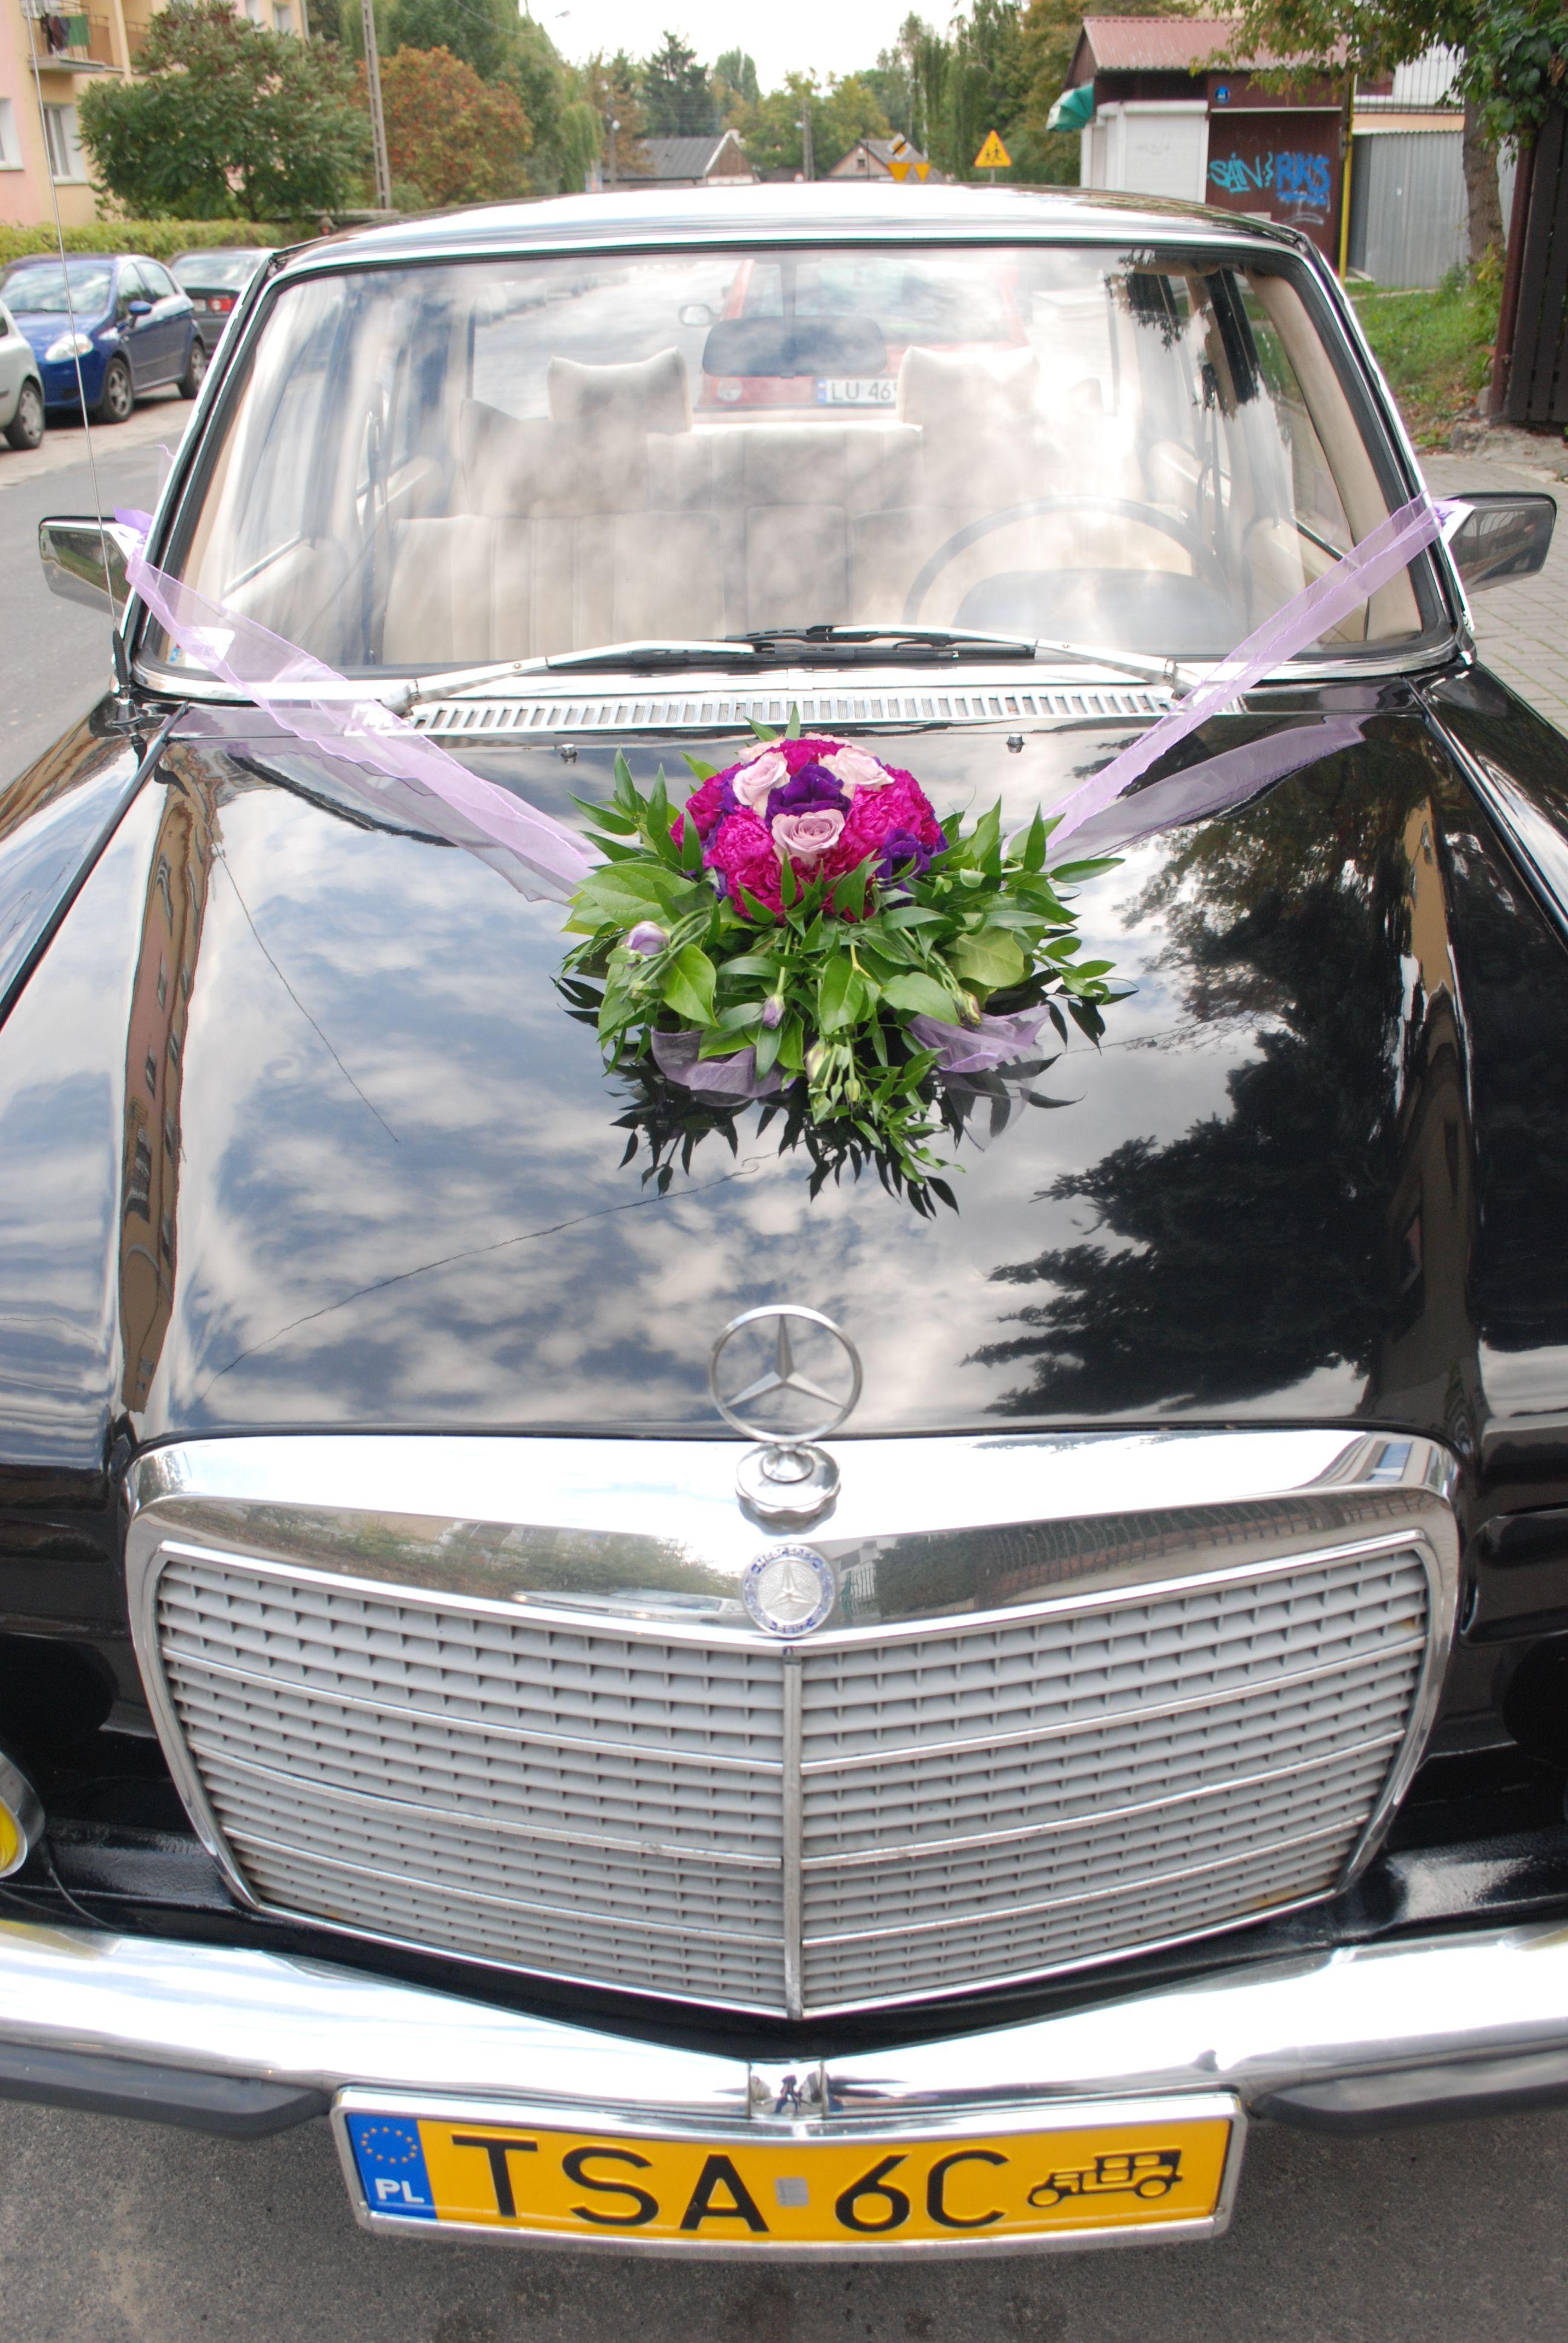 Pin Na Dekoracje Samochodu Na Slub